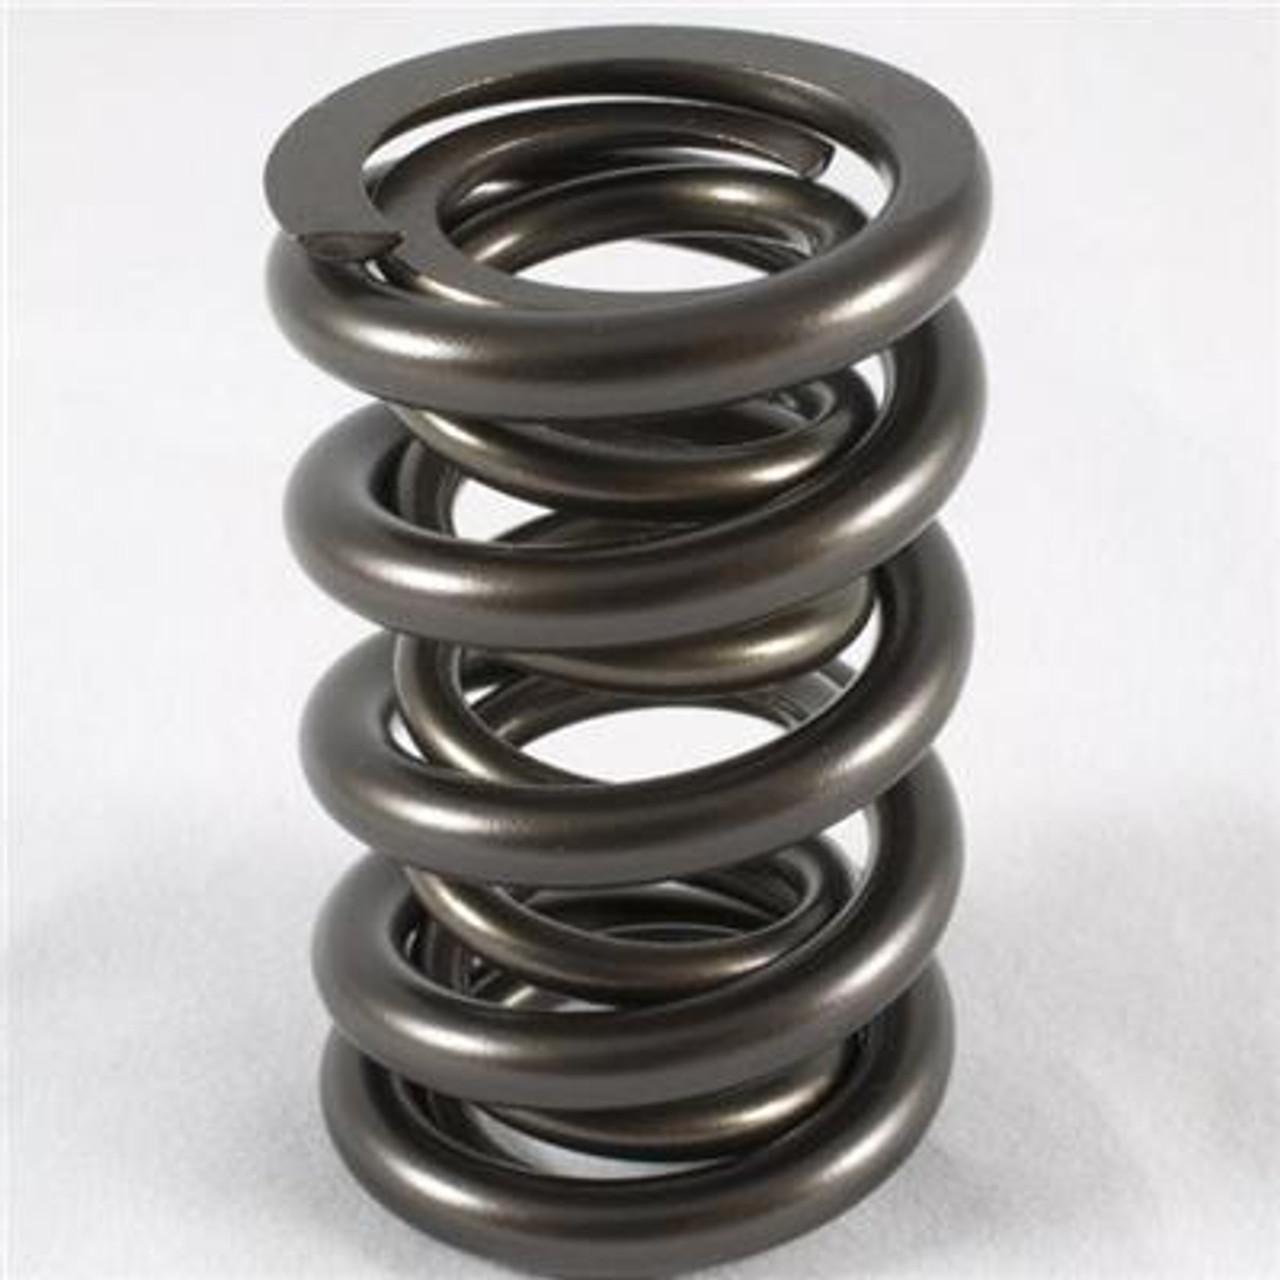 PAC-1225 •Seat Pressure: 250 LBS @ 2.000 Open Pressure: 765 LBS @ 1.200 Coil Bind: 1.150 Max Lift: .800 16/pkg